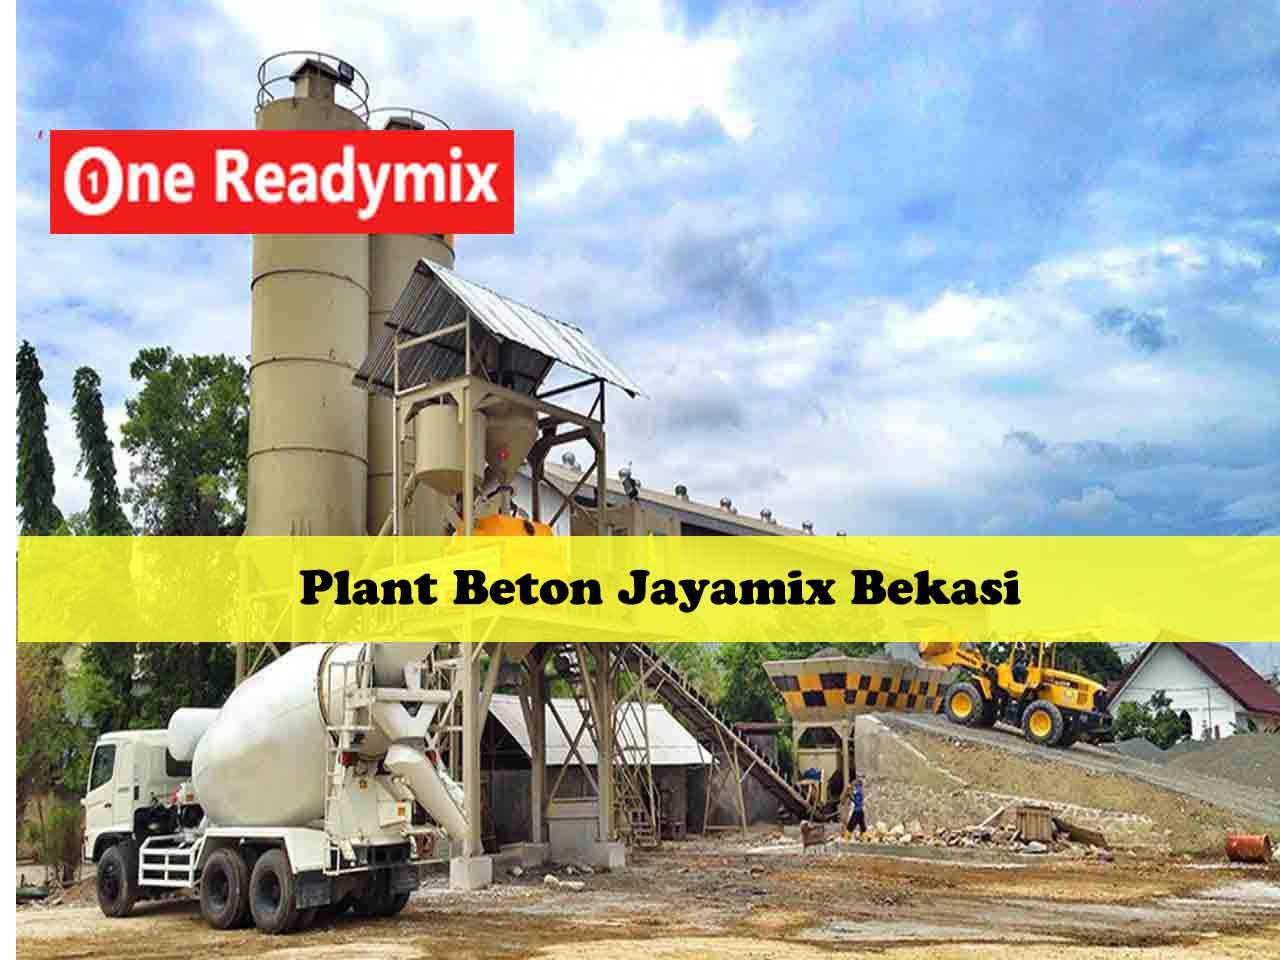 Harga Jayamix Bekasi, Beton Cor Jayamix Bekasi, Jual Beton Jayamix Bekasi, Cor Jayamix Bekasi, Tempat Beli Jayamix di Bekasi